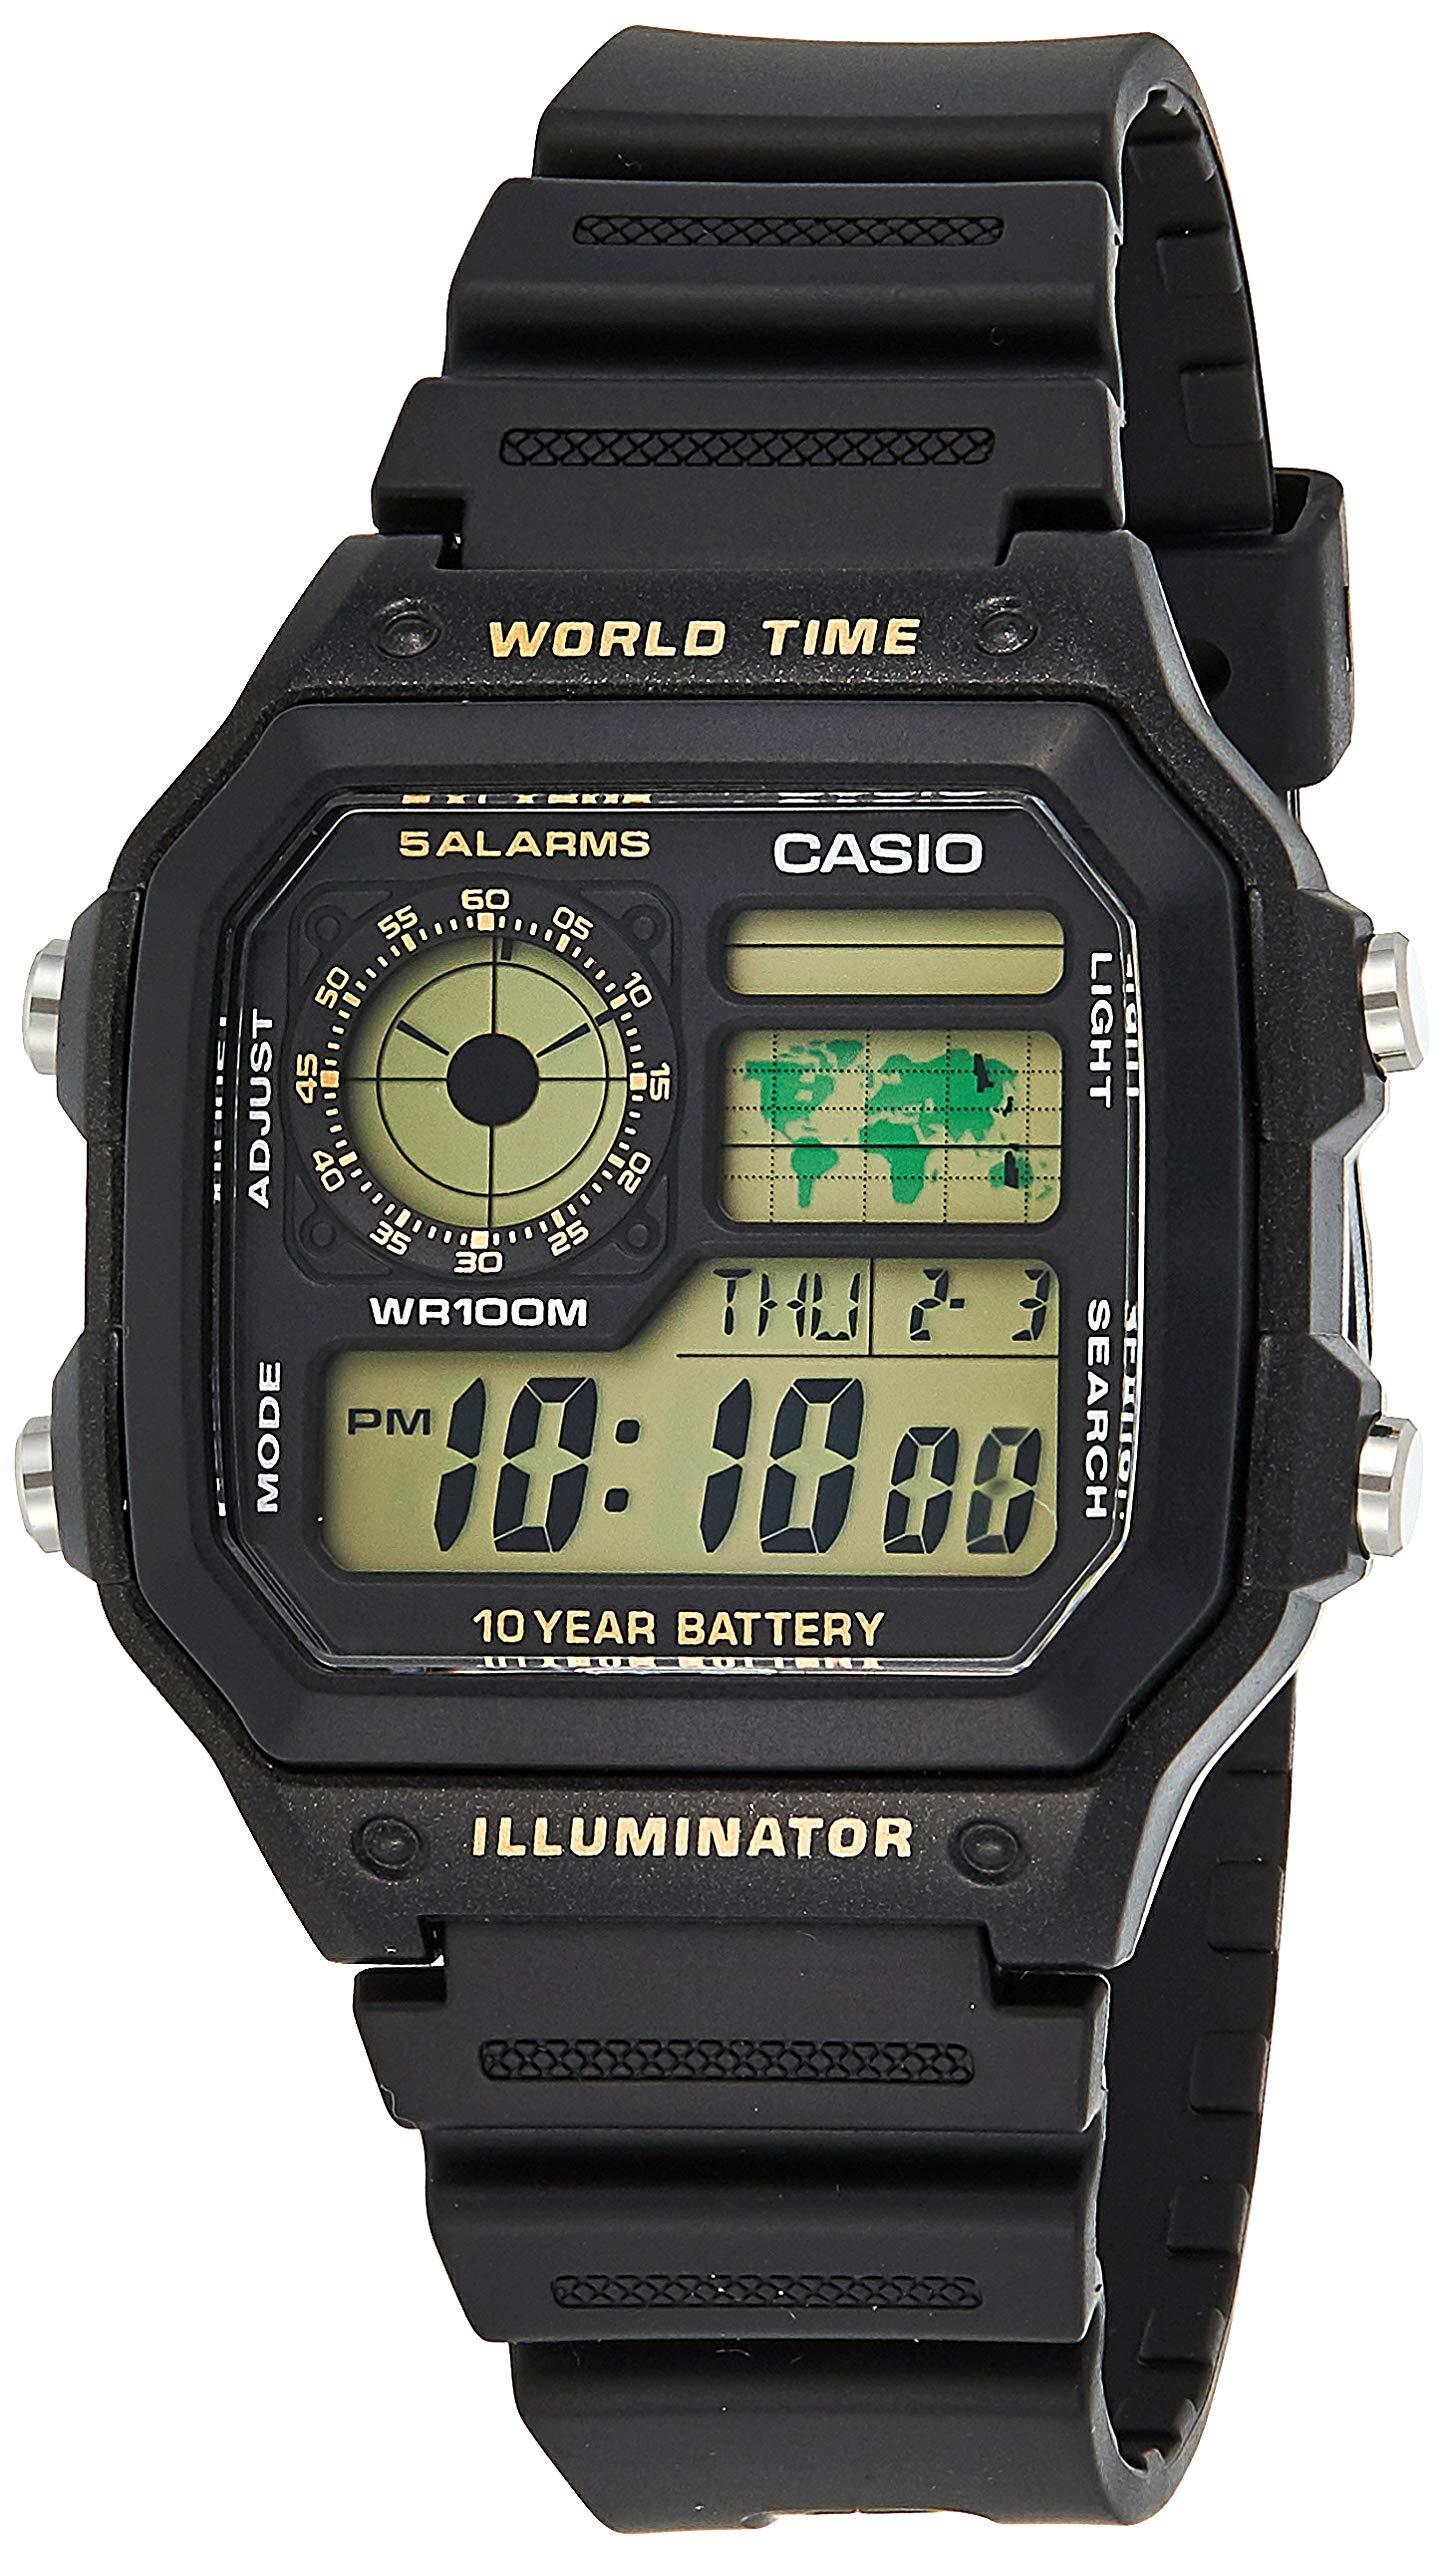 Classic Black Watch AE1200WH-1B